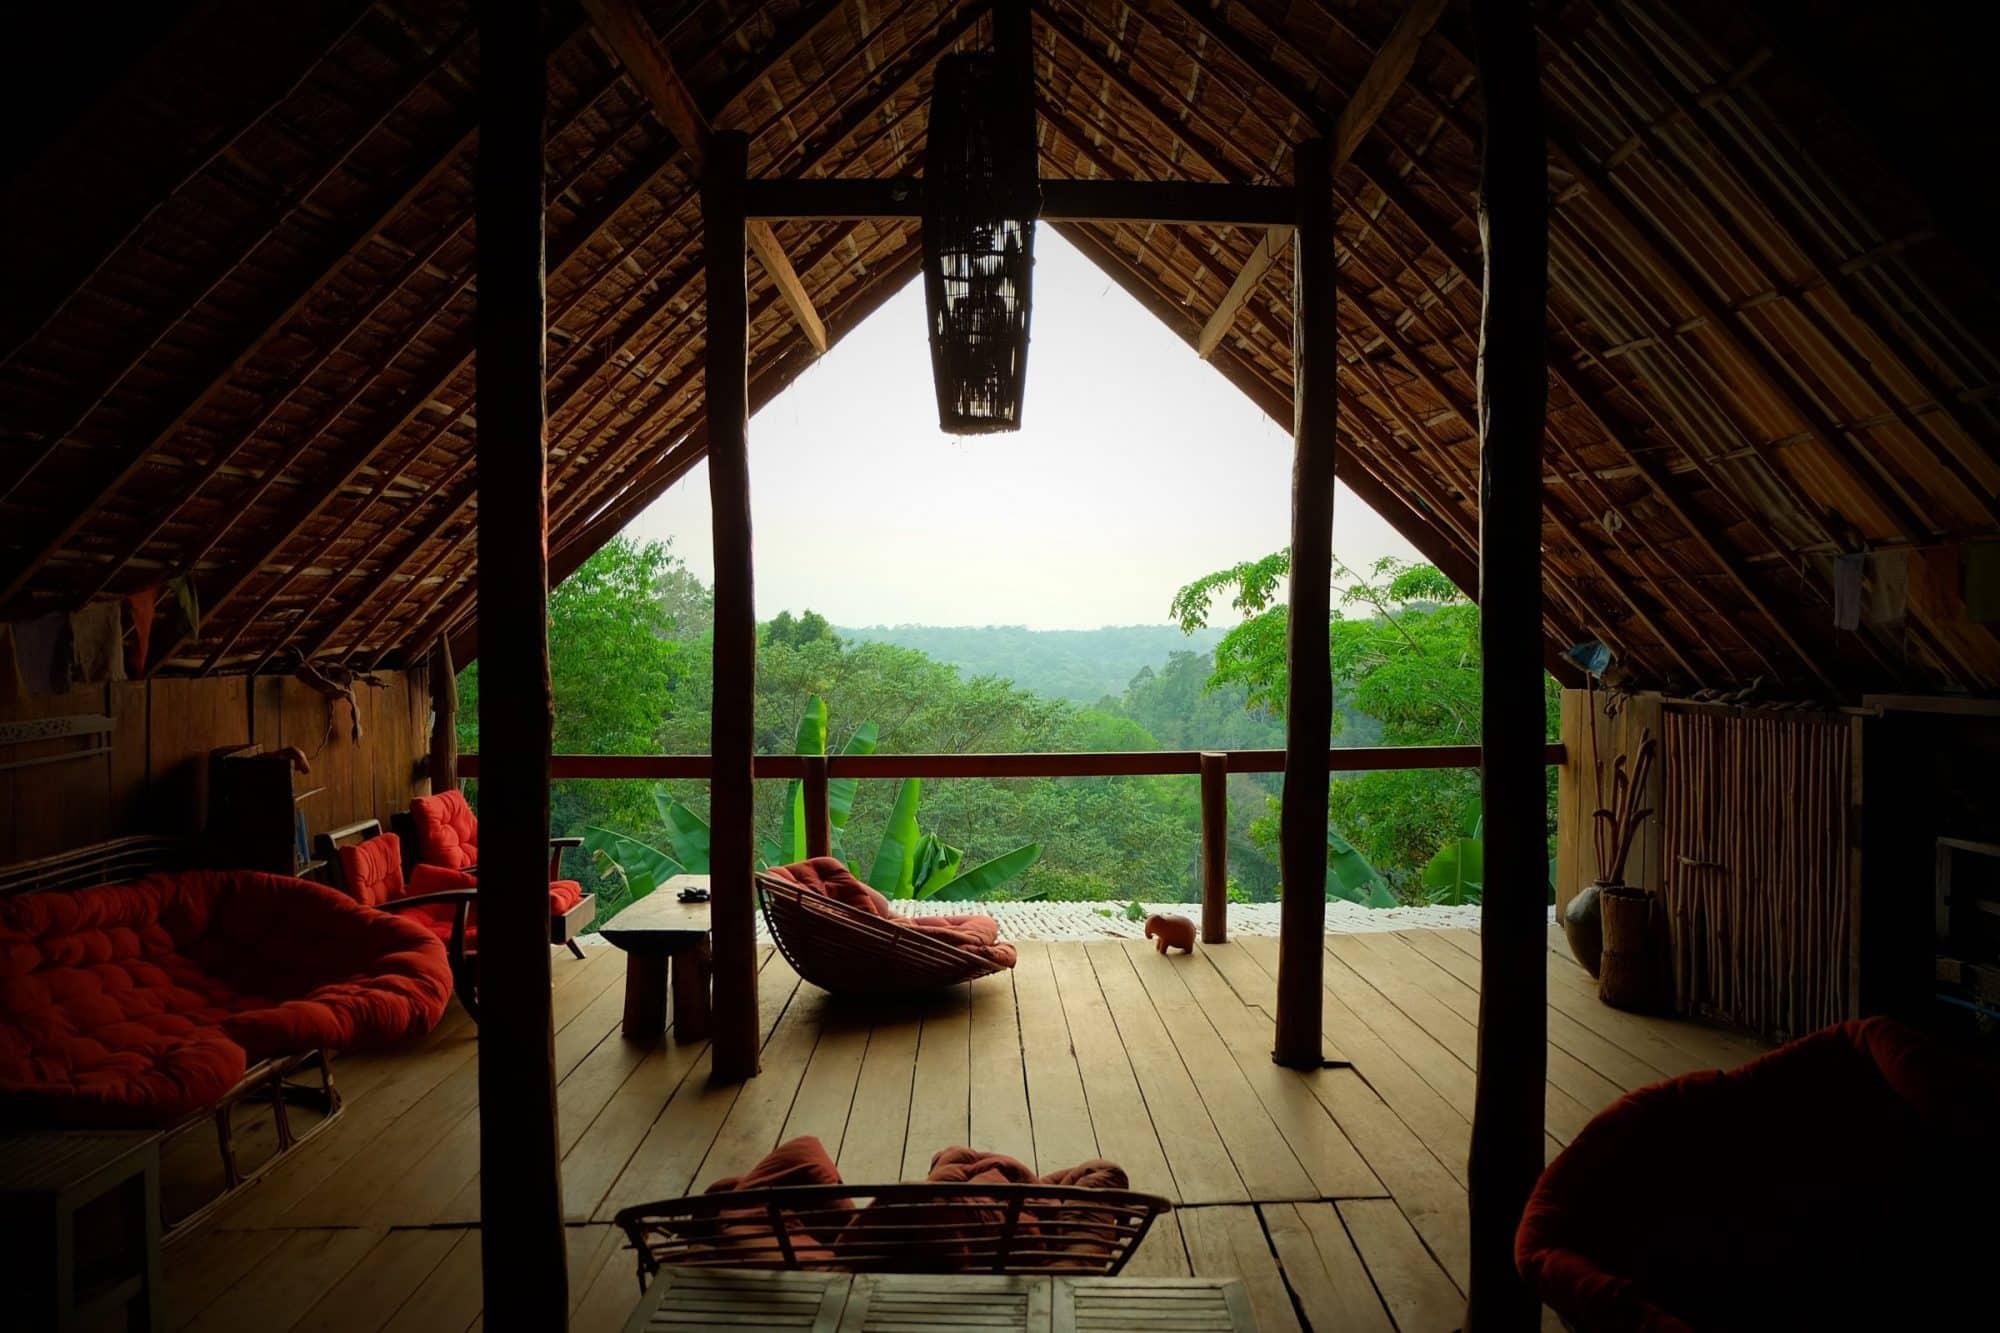 Jungle view at the Elephant Sanctuary